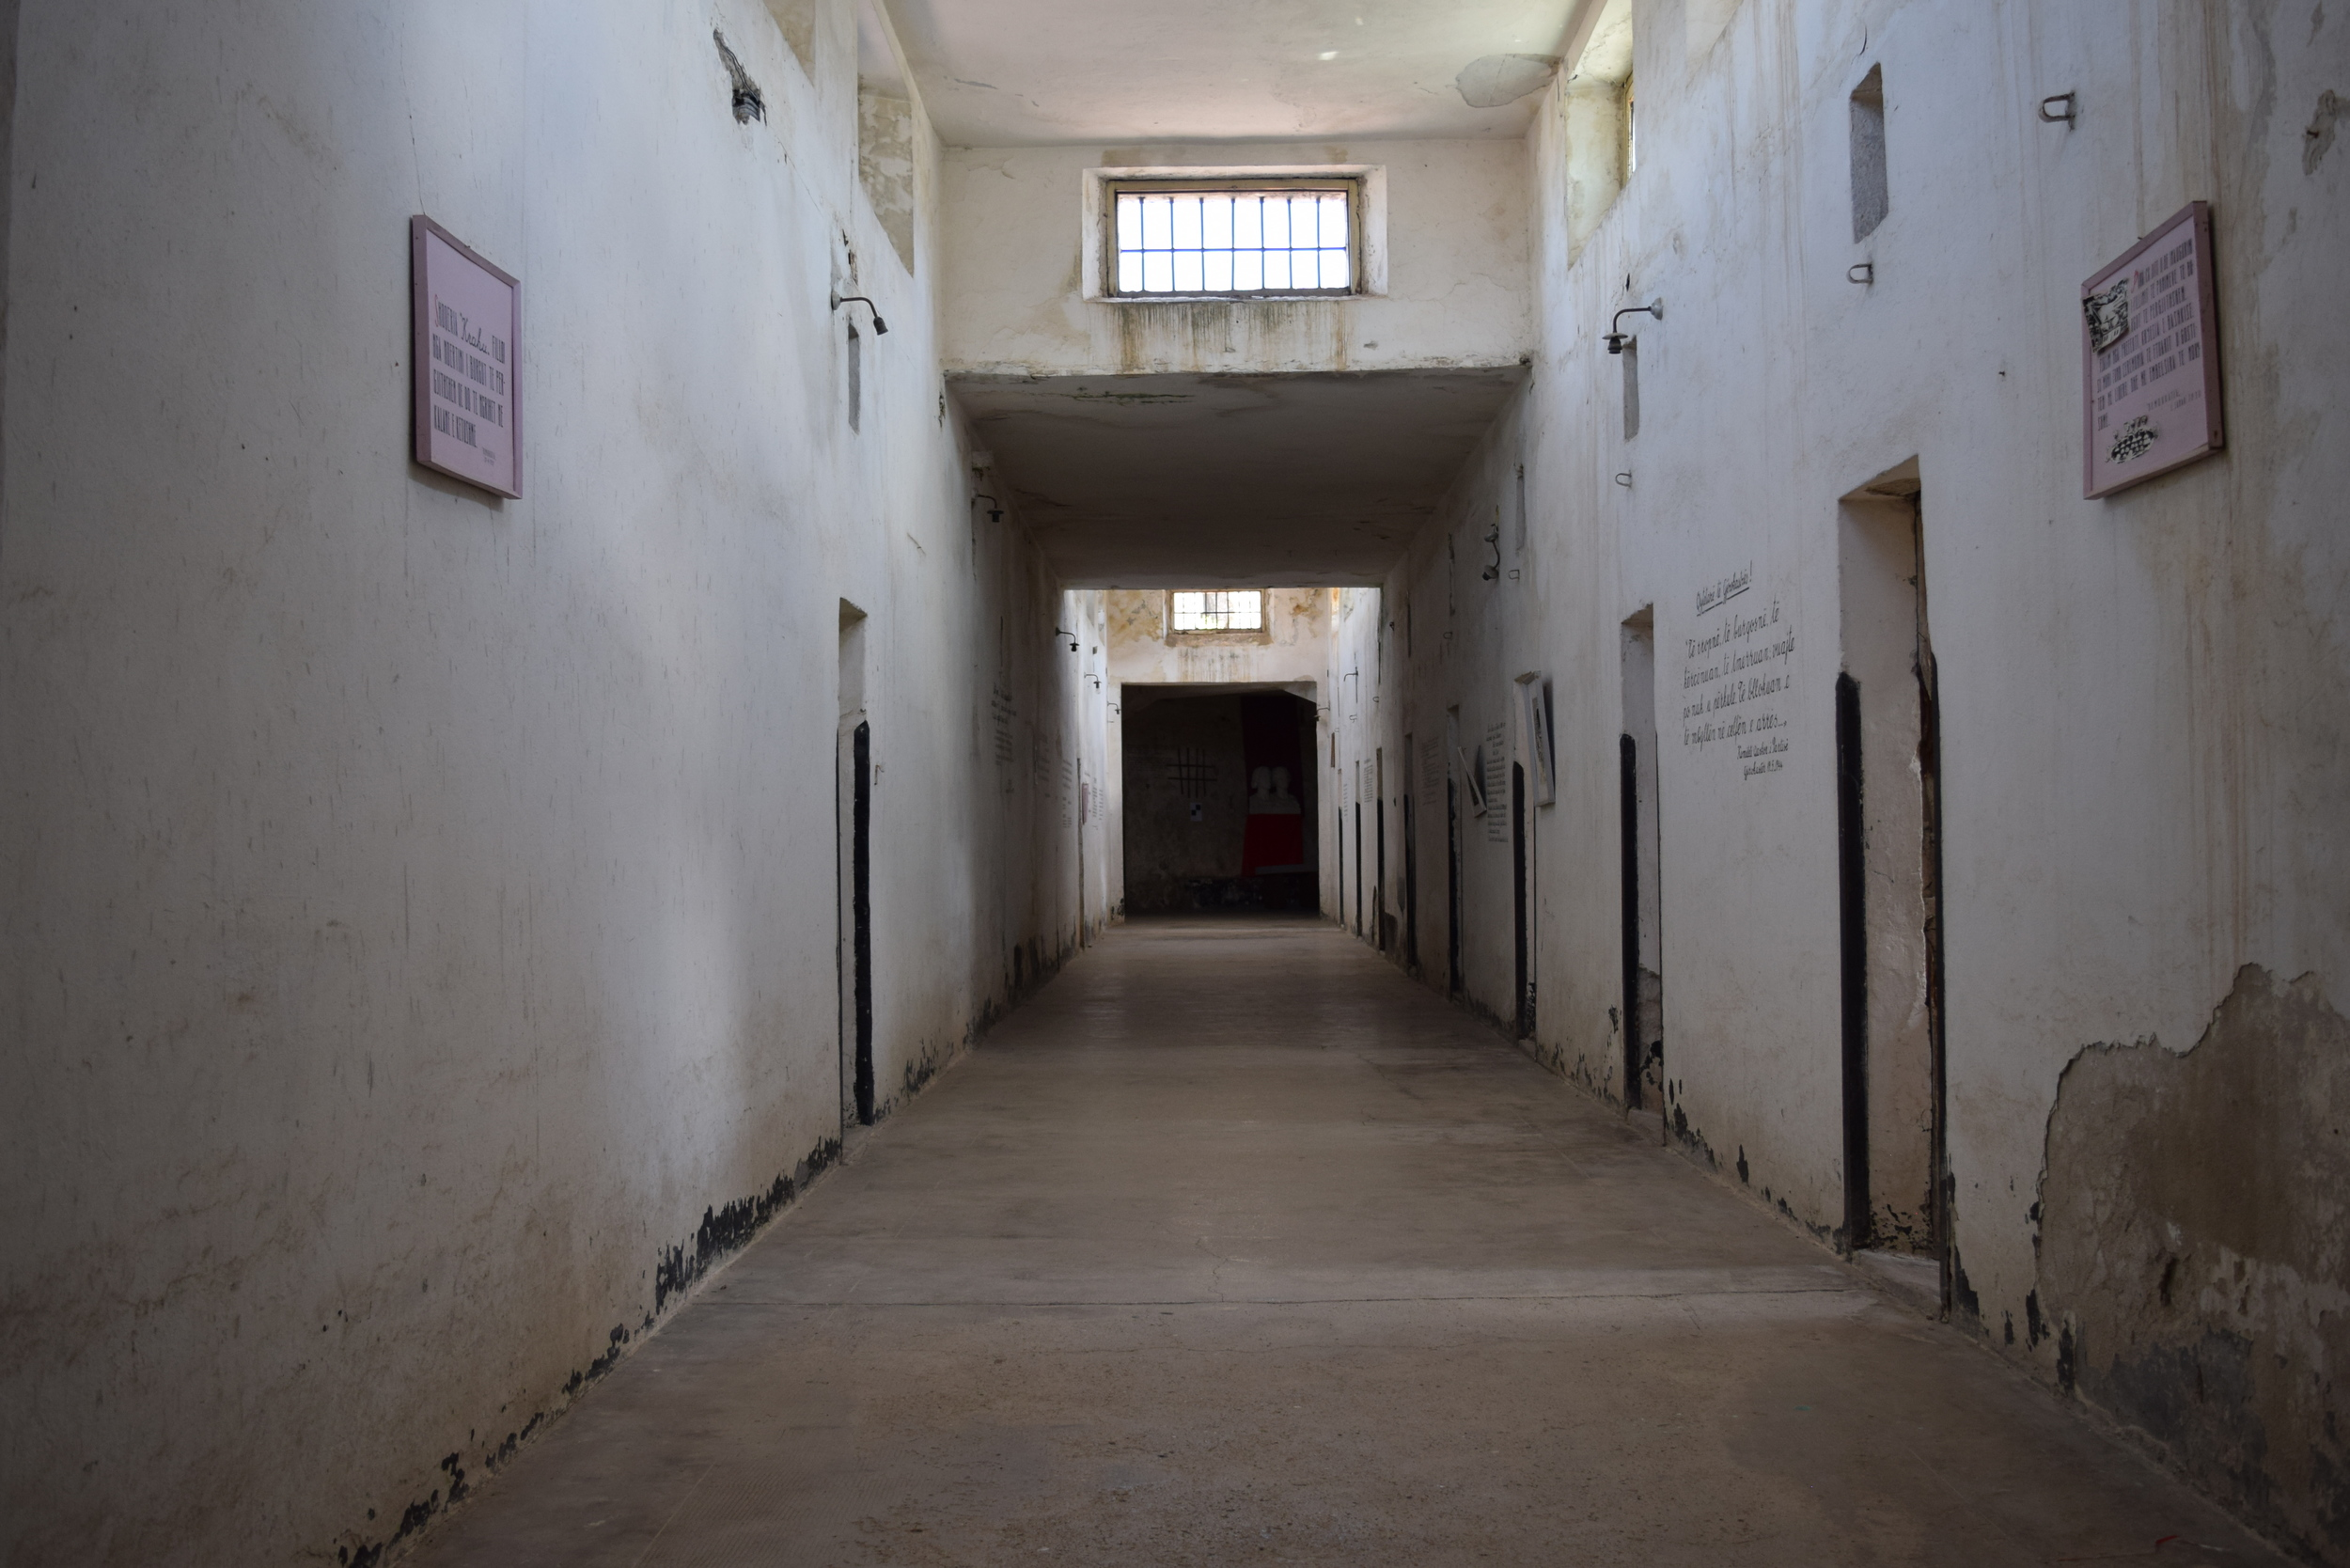 Hallway of the castle prison